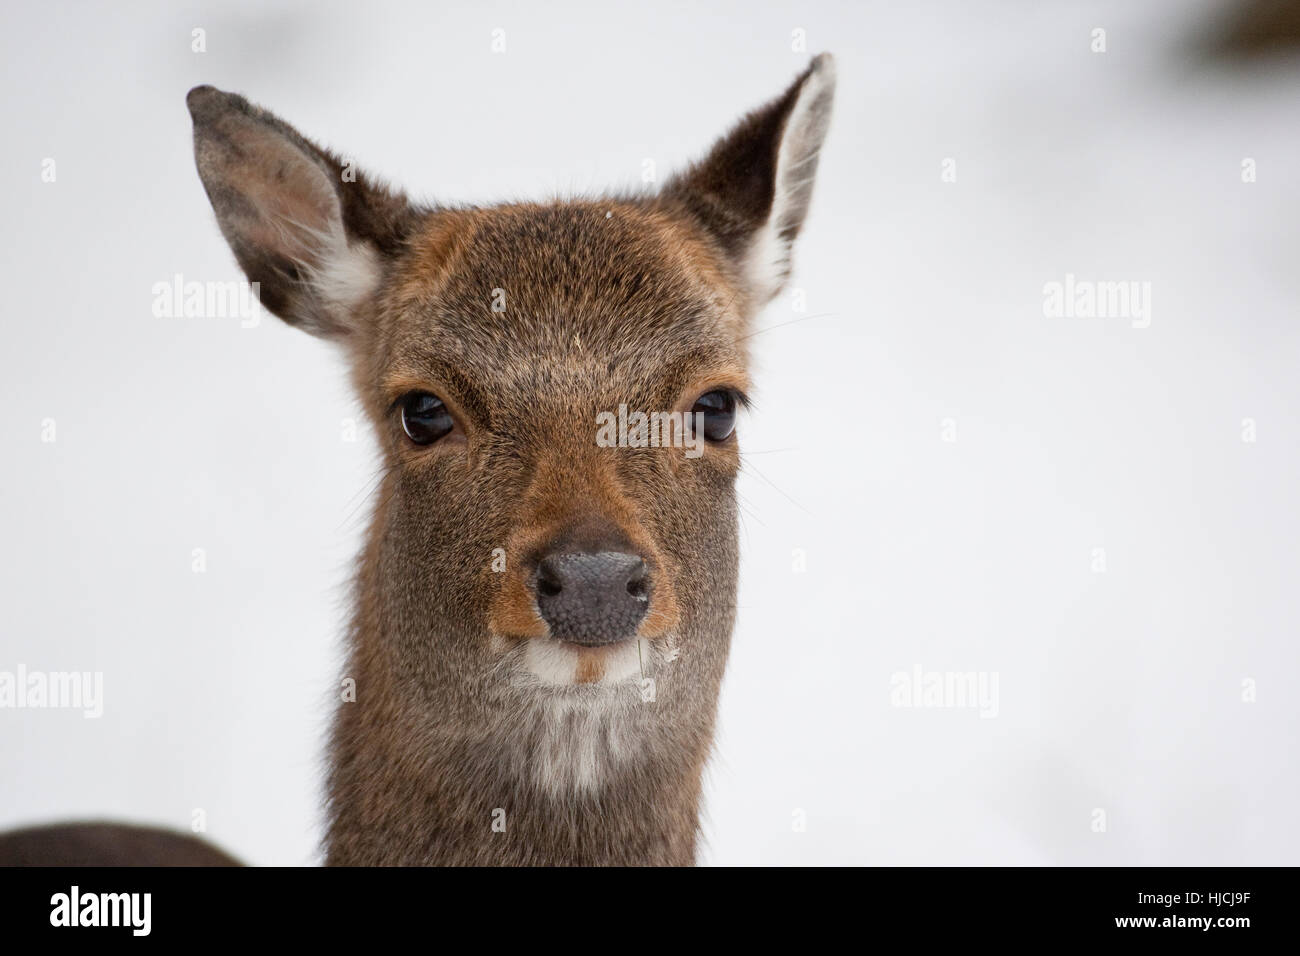 Sika, Sika-Hirsch, Sikahirsch, Sikawild, Sika-Wild, Jungtier, Cervus nippon, cervi sika Immagini Stock